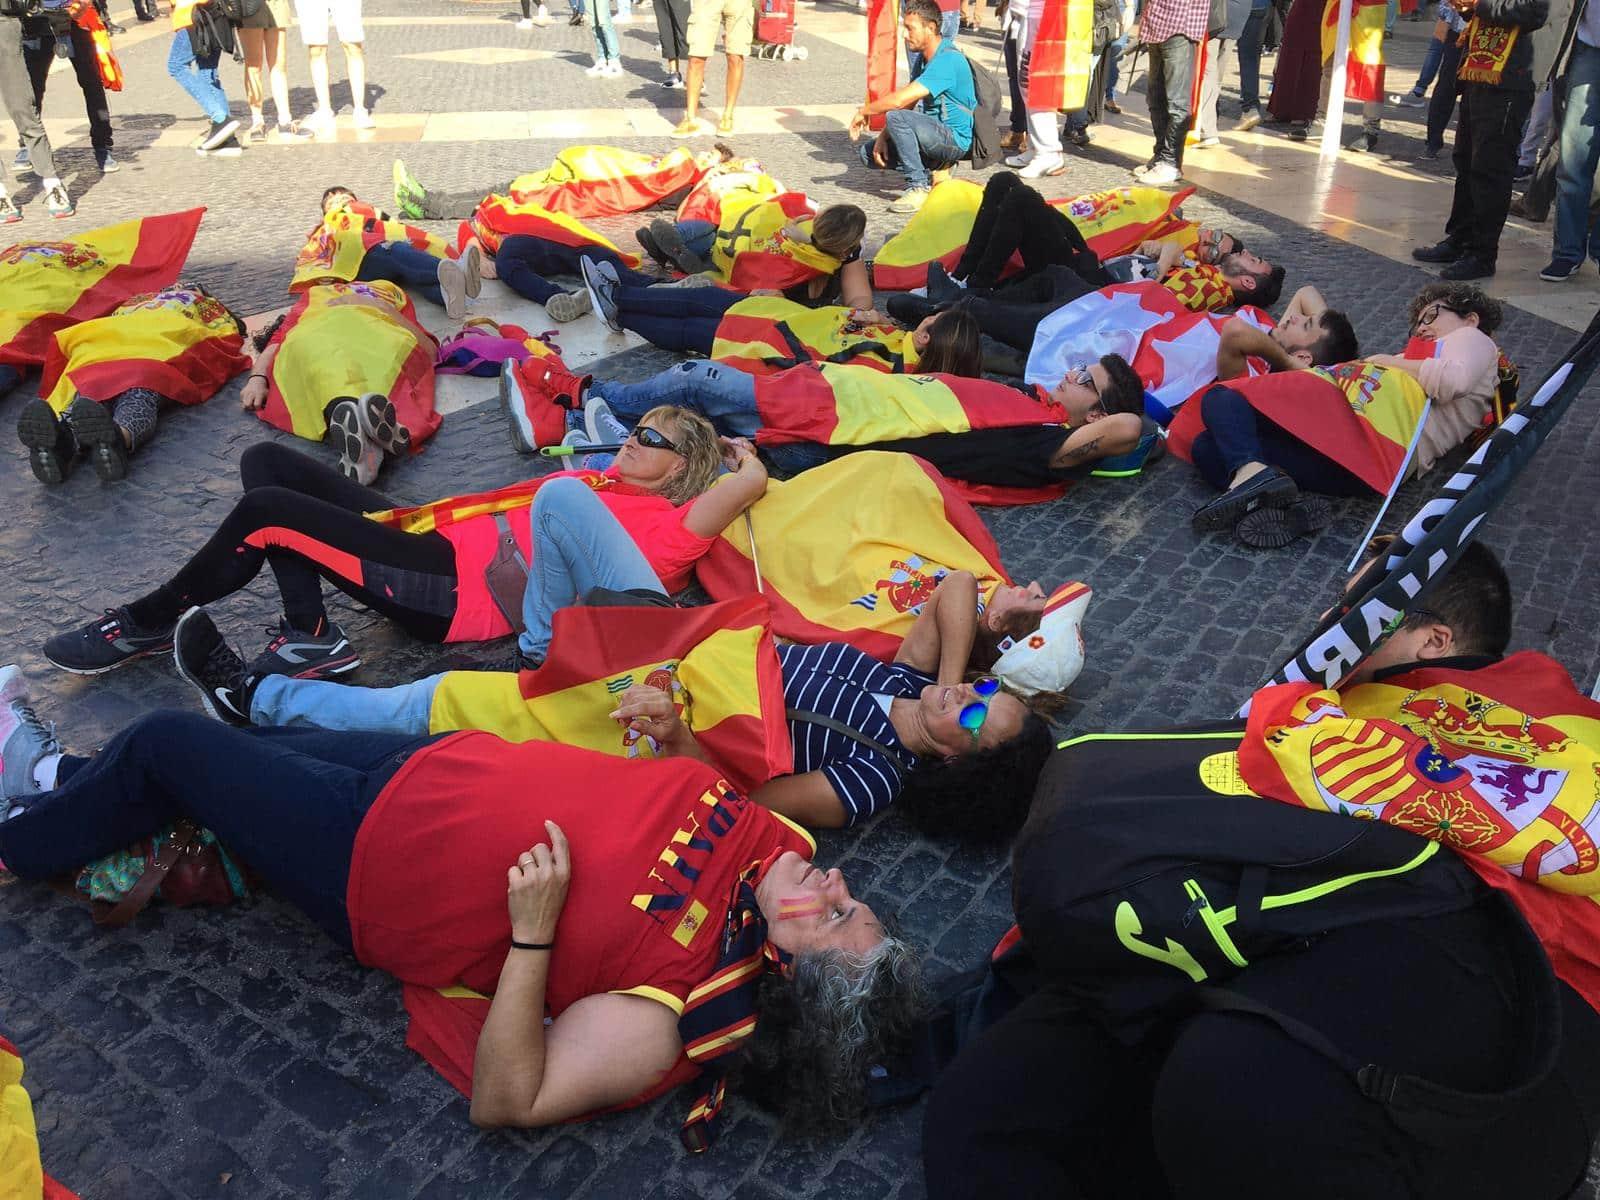 barcelone manifestation